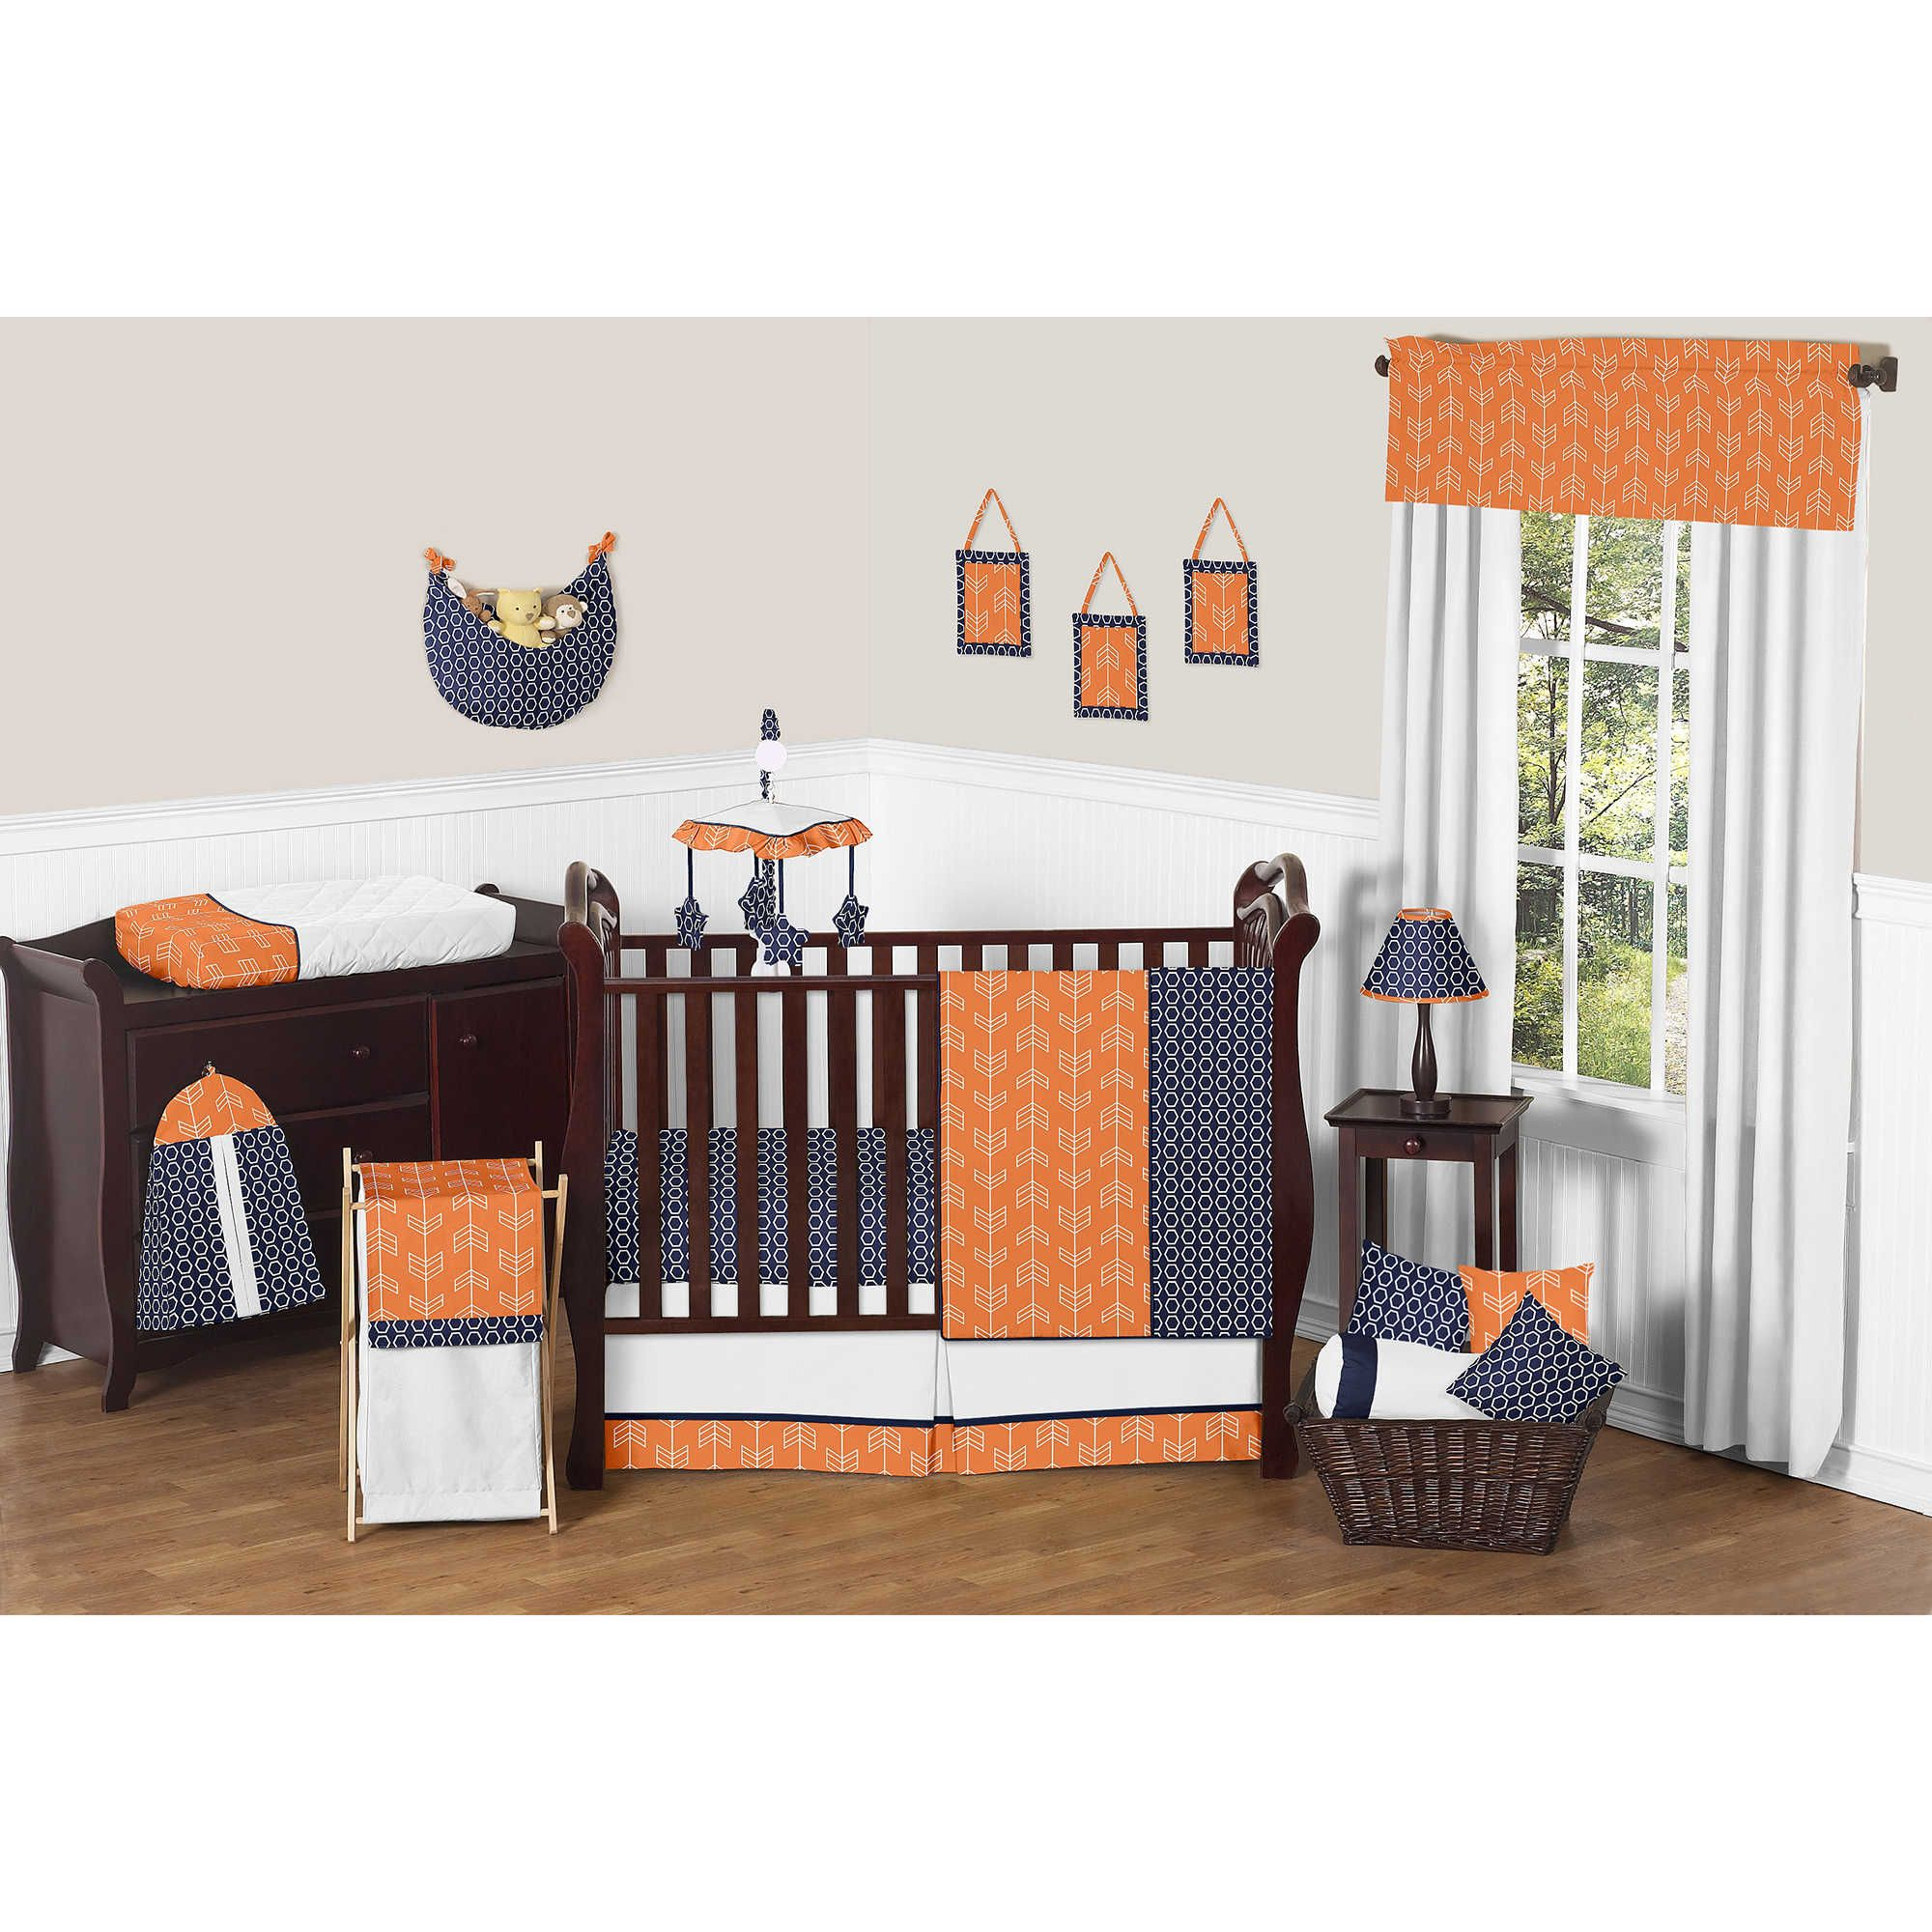 bed s jojo grey baby cribs bedding interior pc sweet navygray crib navy boys designs and blue plaid